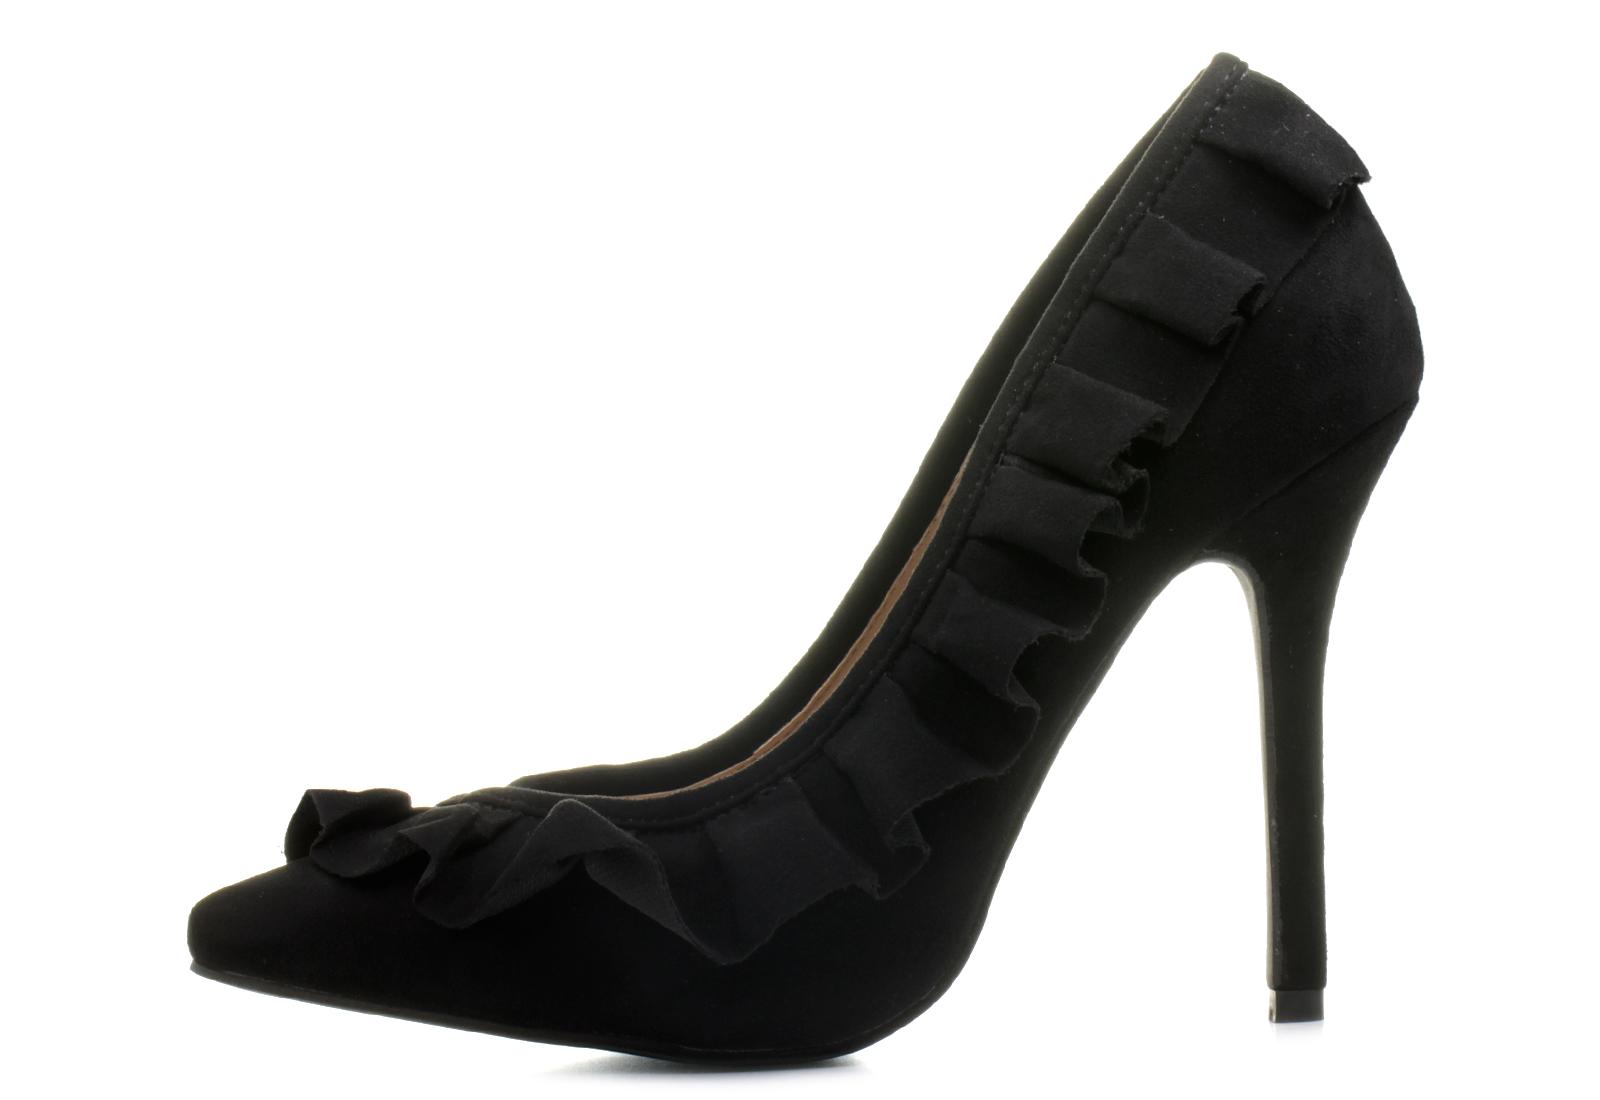 Kitten High Heels - Sassa - Sassa-blk - Online shop for sneakers ...